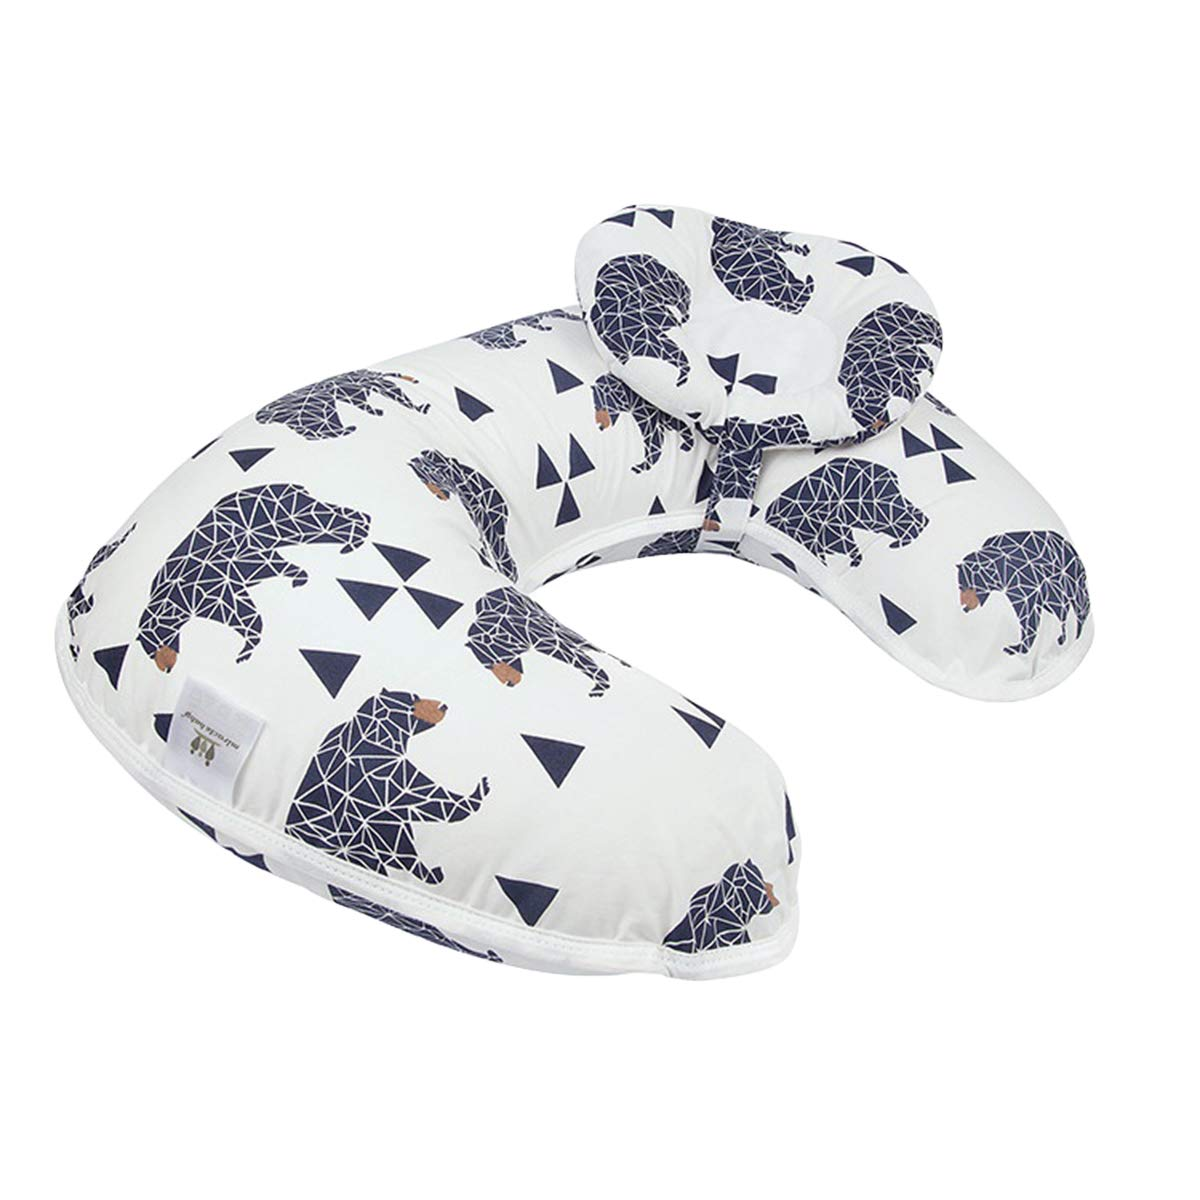 Borje New Design 45/°Angle Newborn Breastfeeding Adjustable Pillow for Babies Nursing Baby Lounger